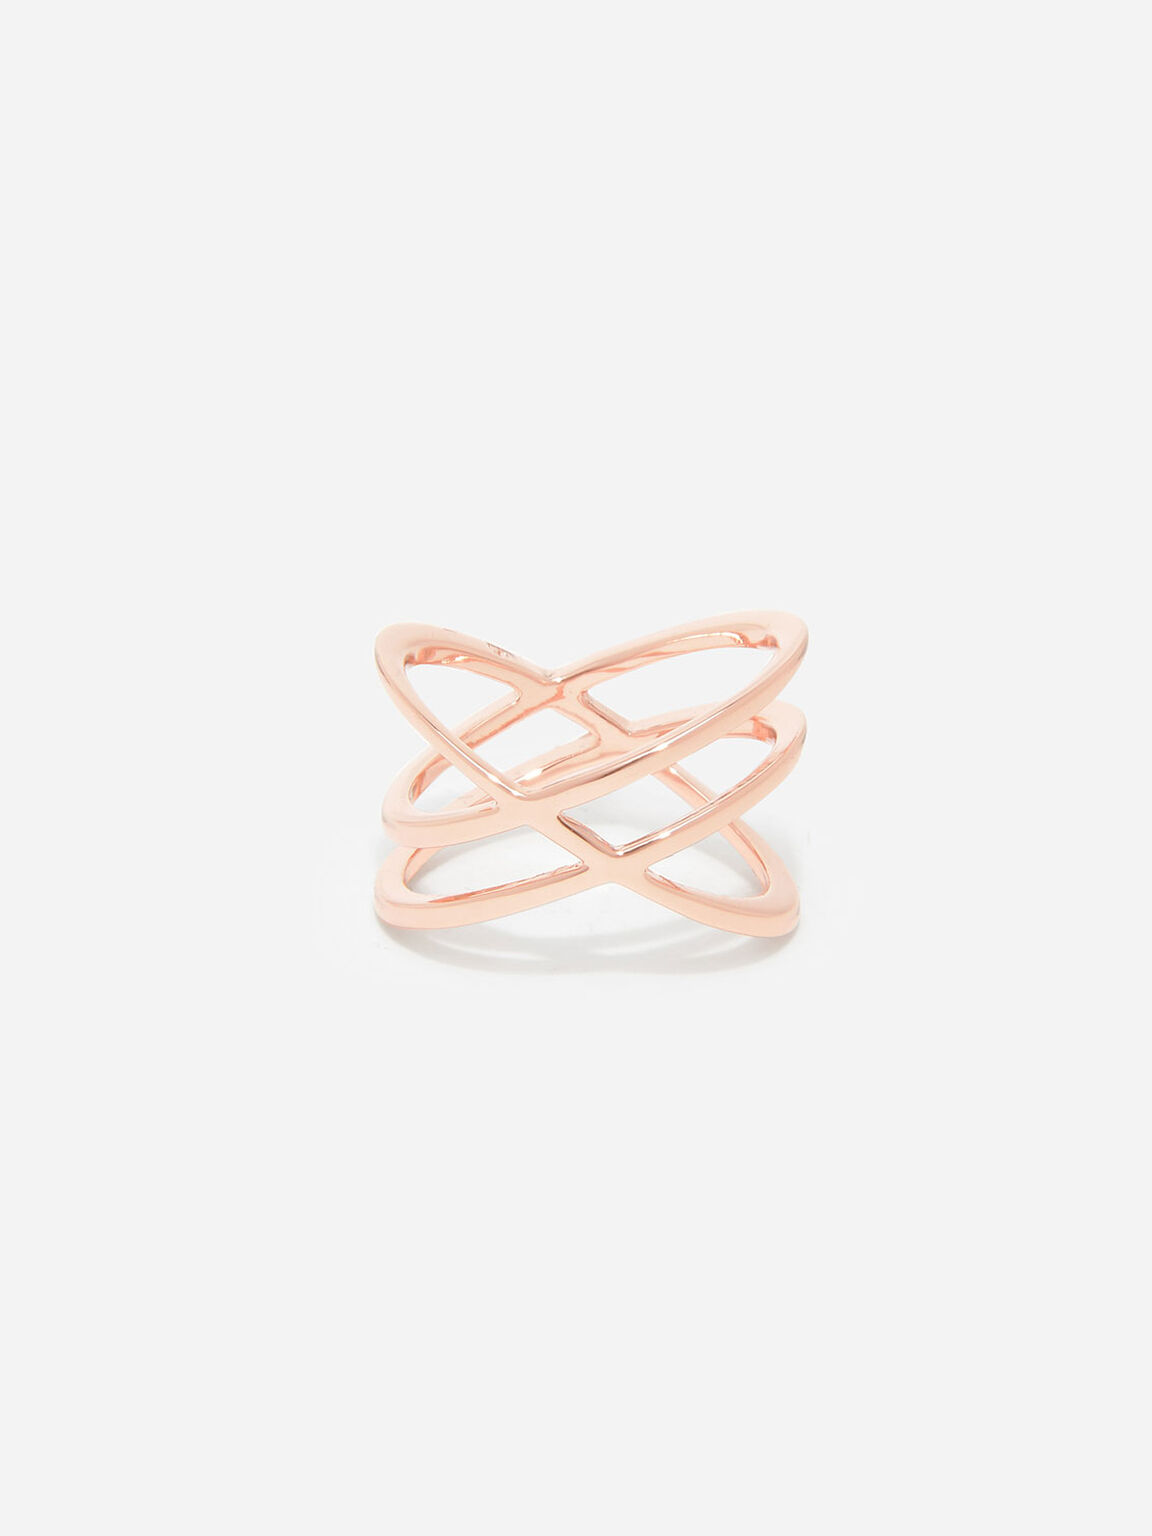 Criss Cross Ring, Rose Gold, hi-res